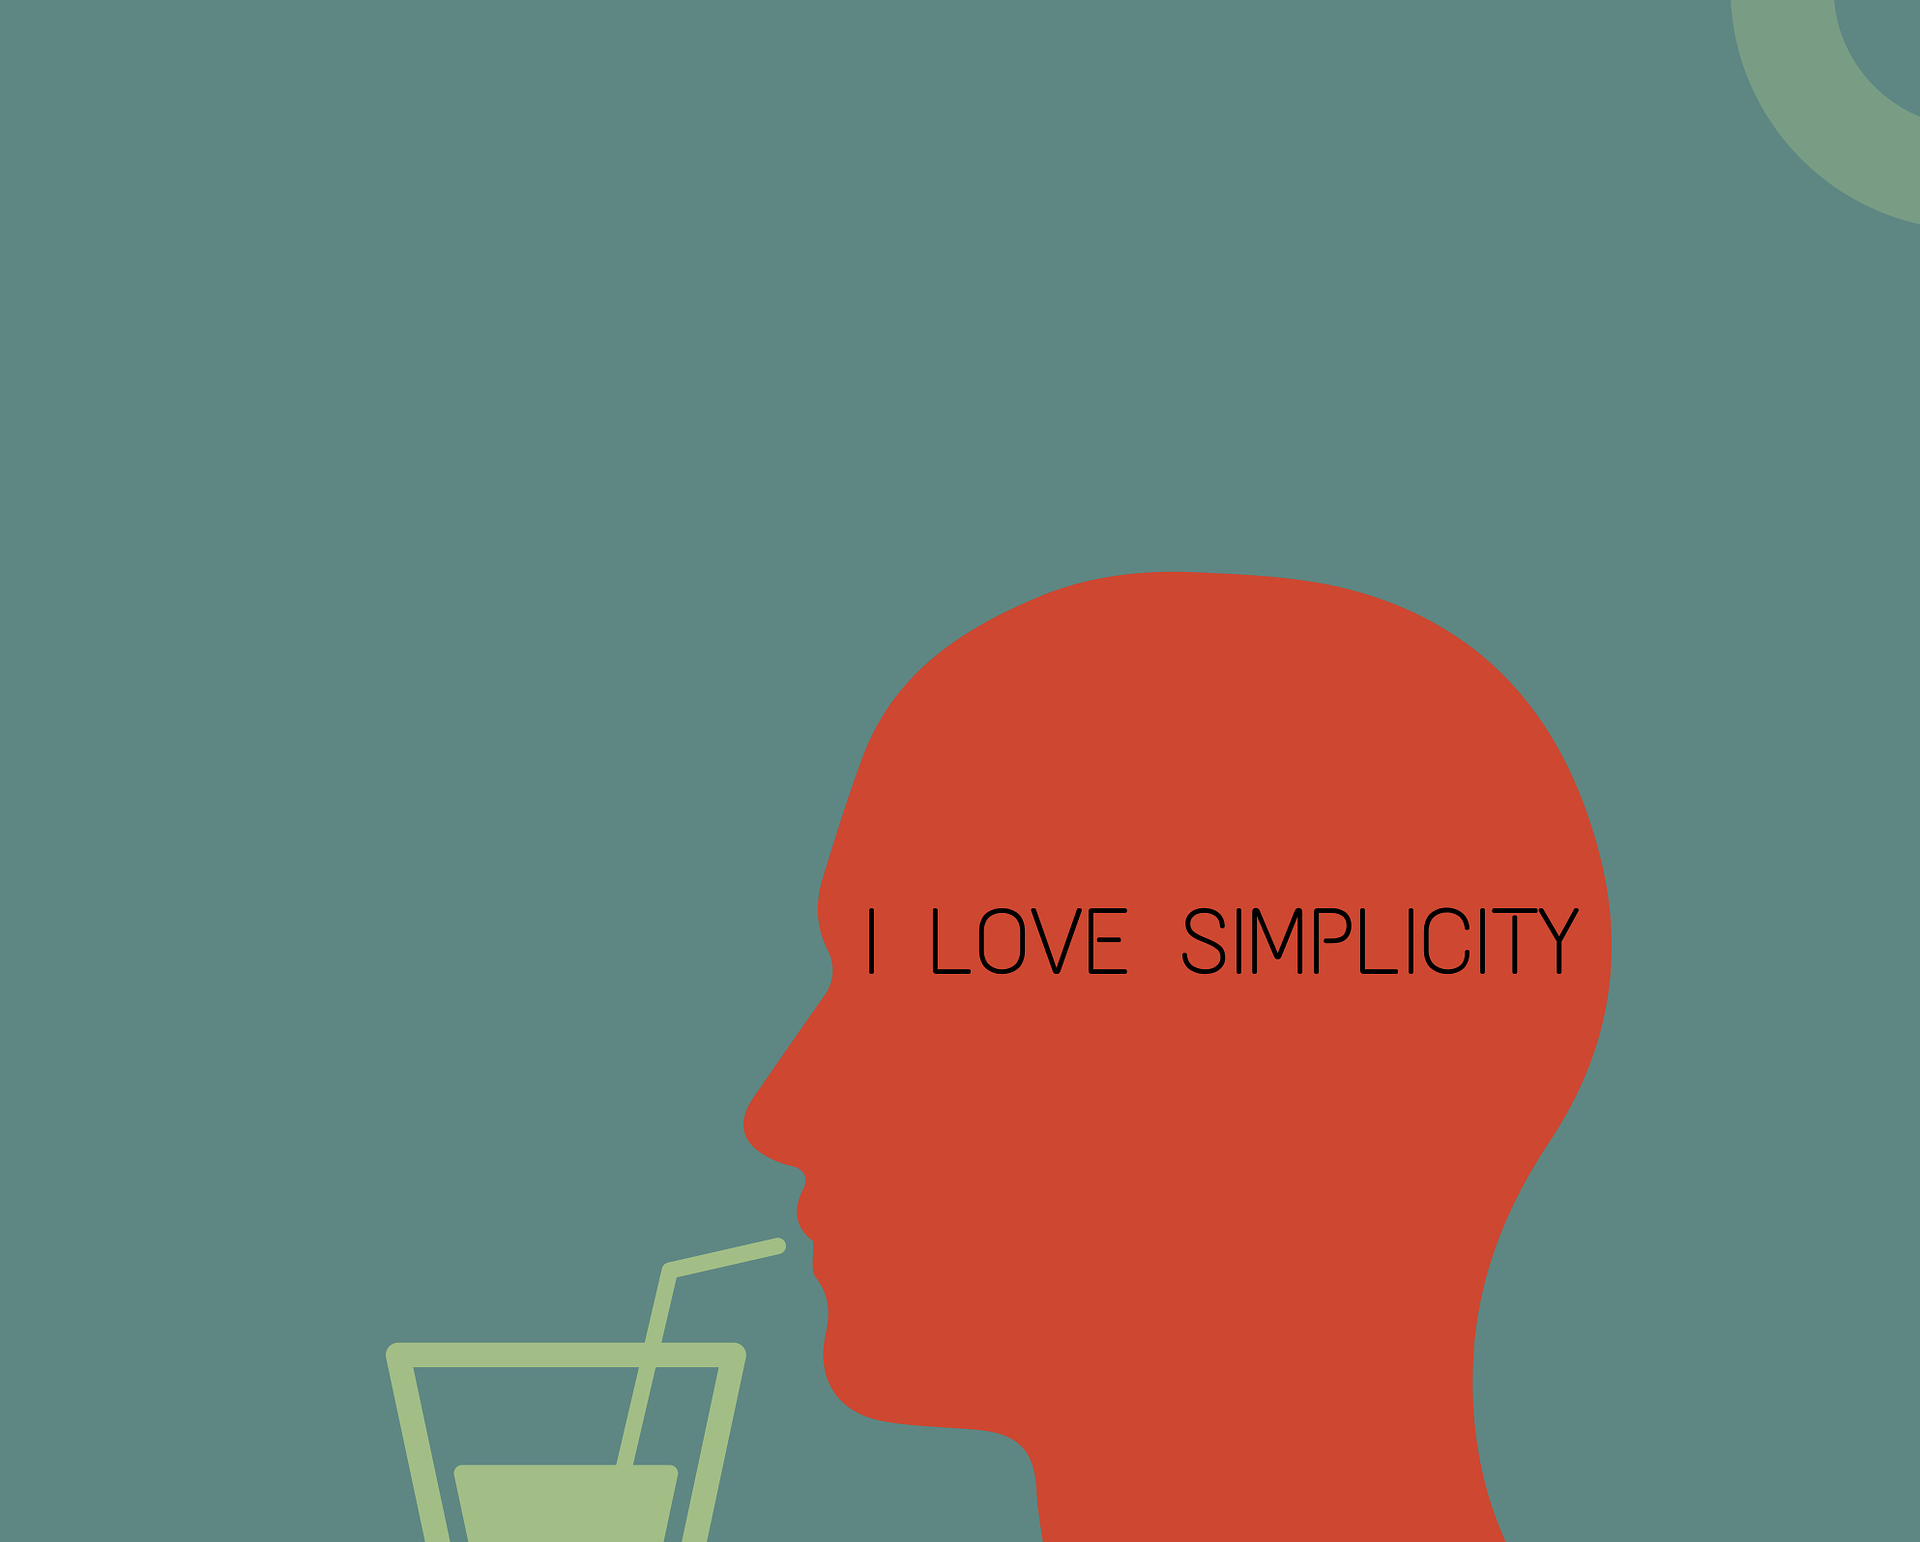 minimalism-241876_1920_bohemienne